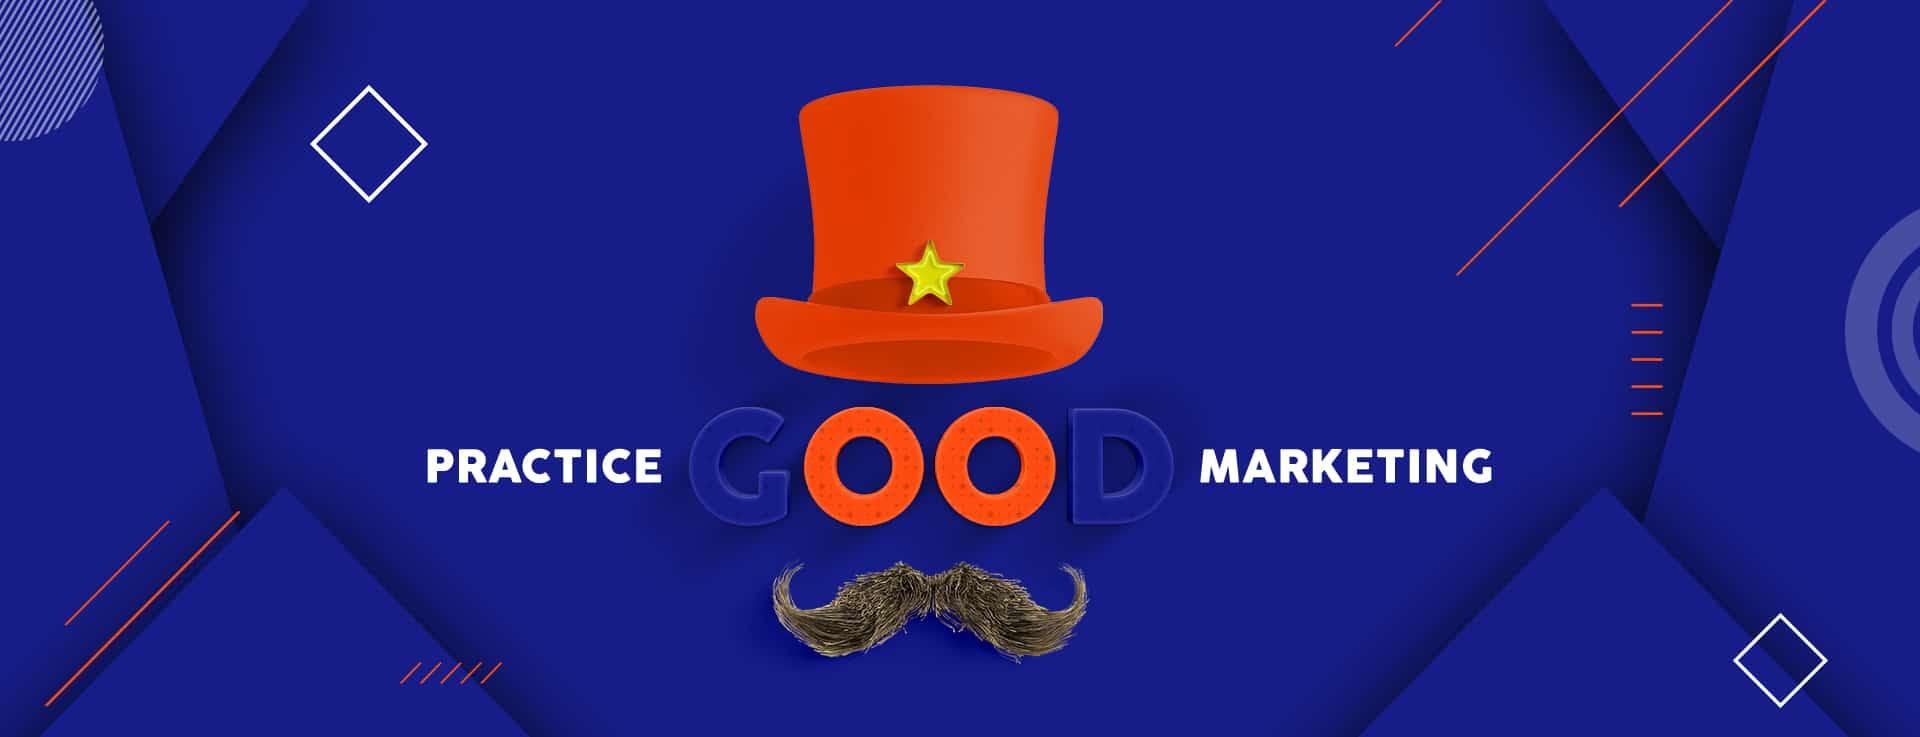 Practice Good Marketing